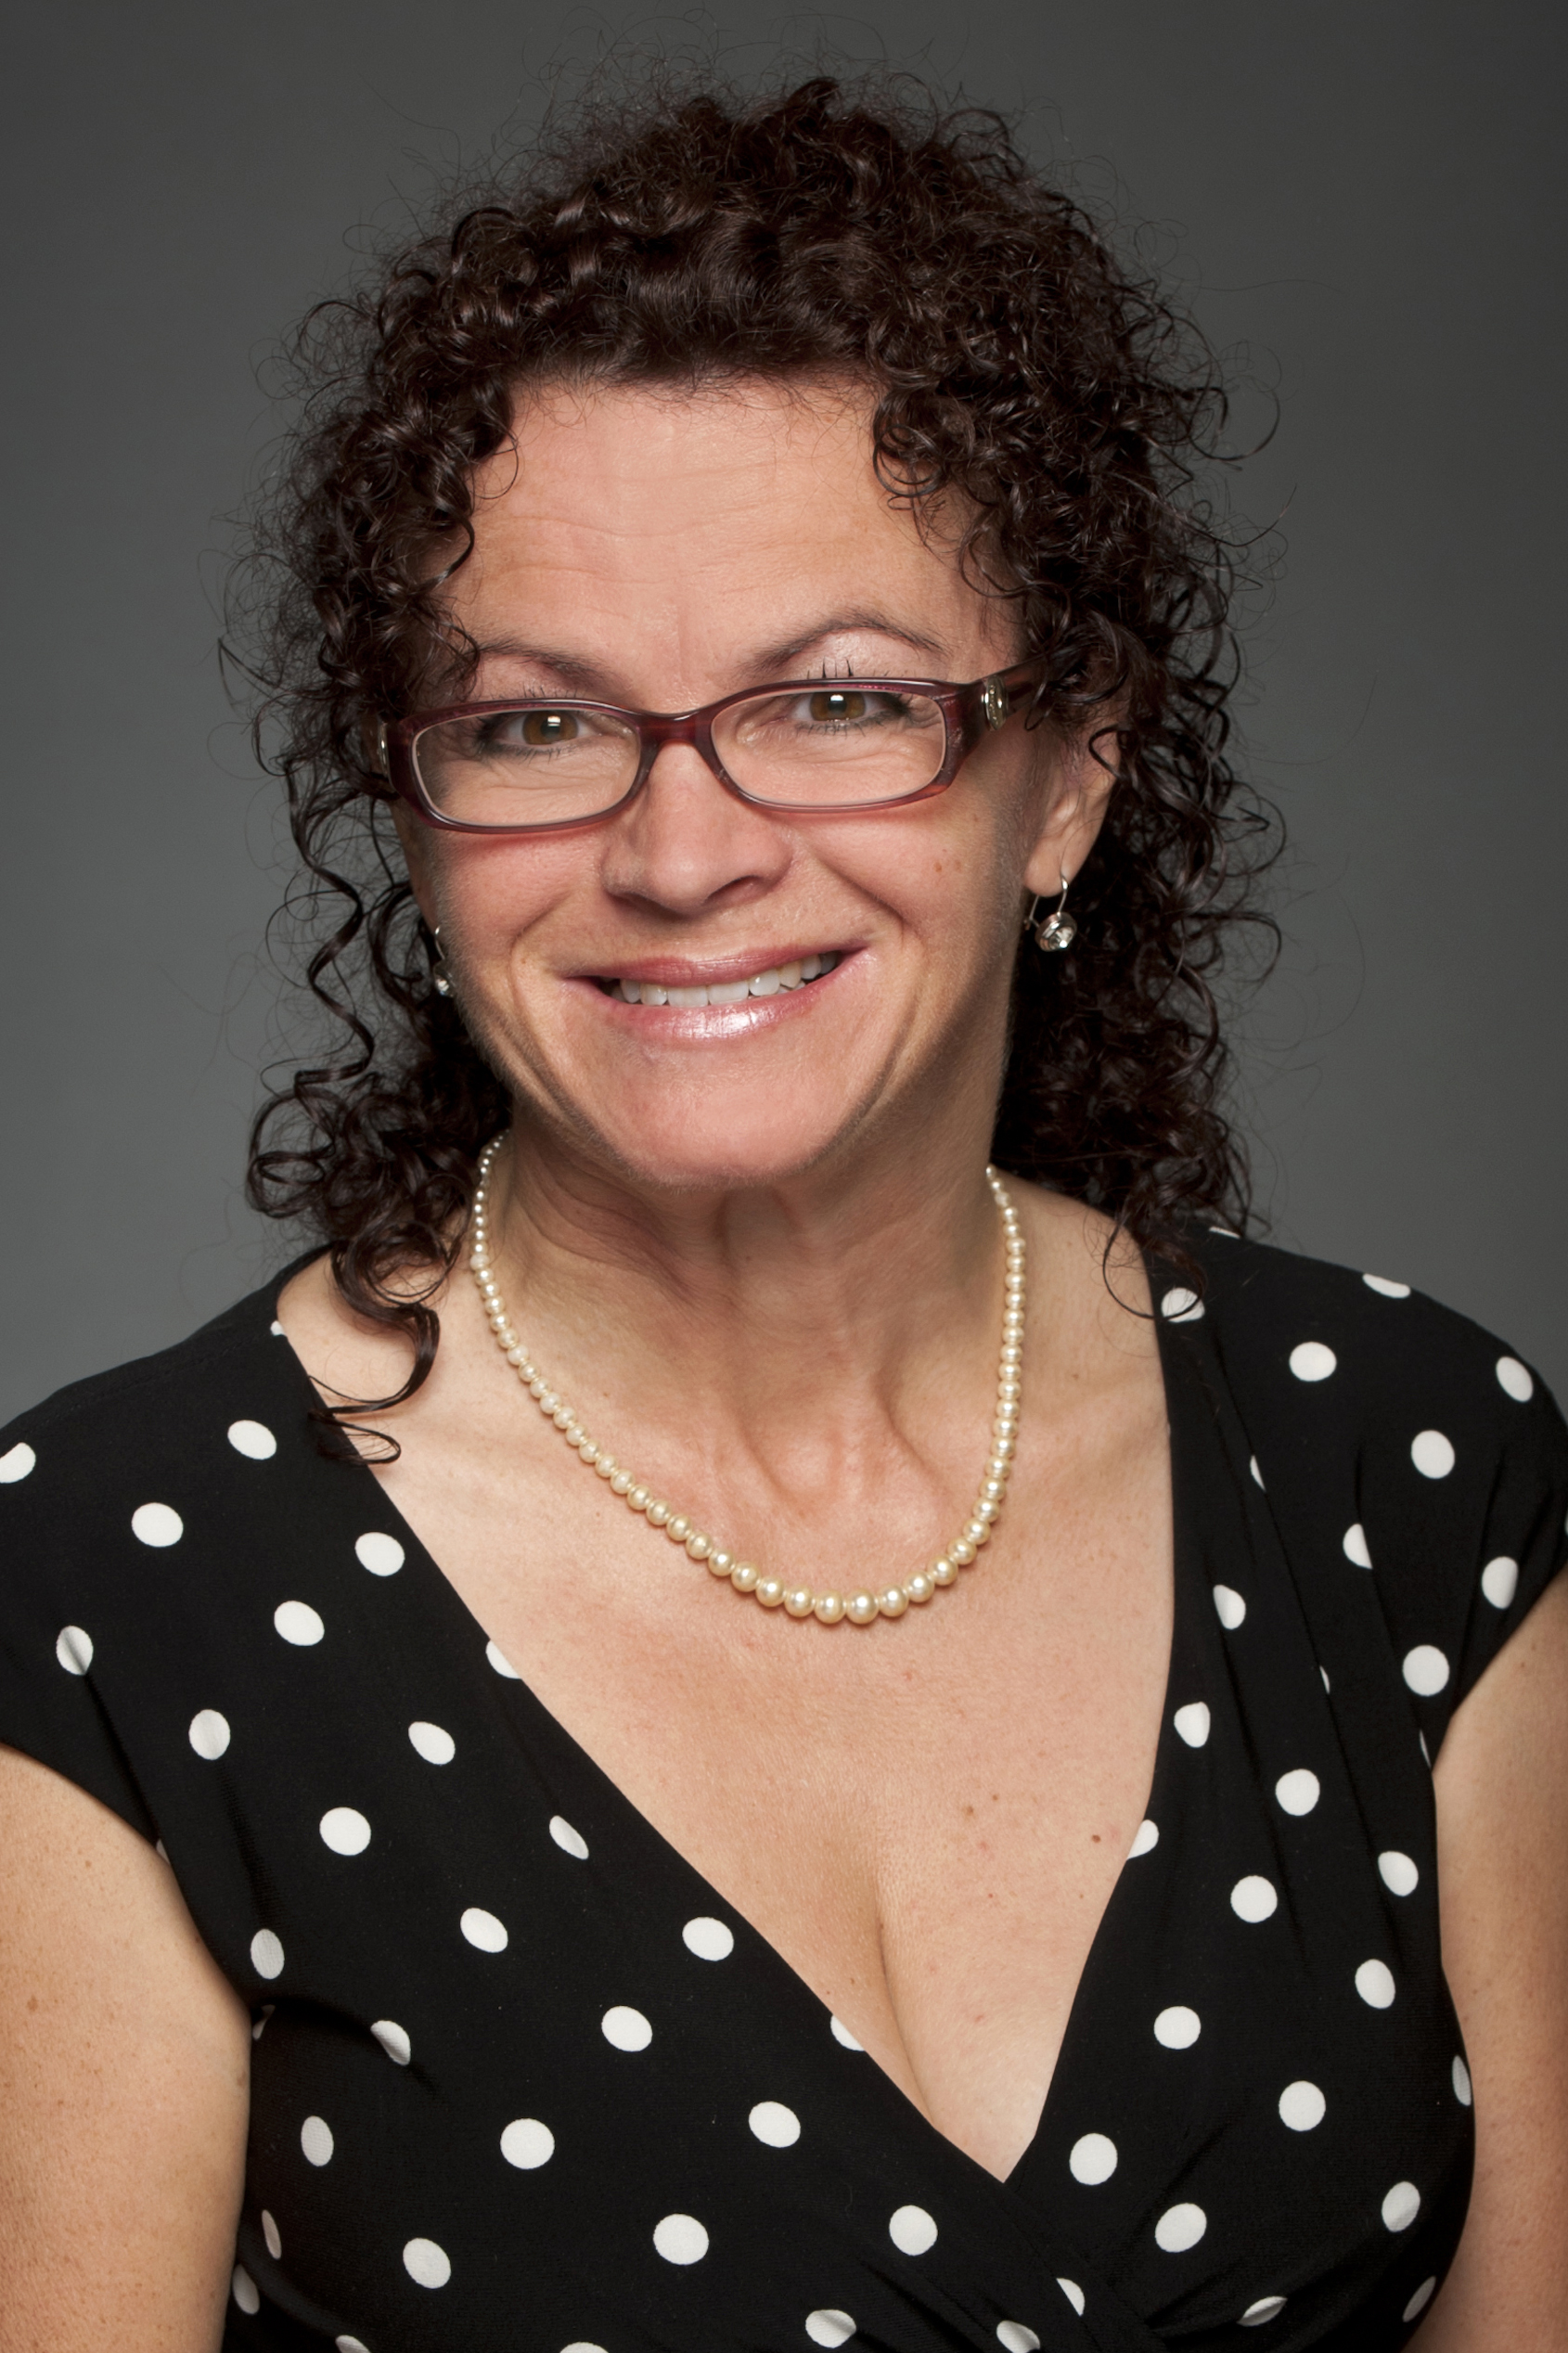 Lucie Gravelle